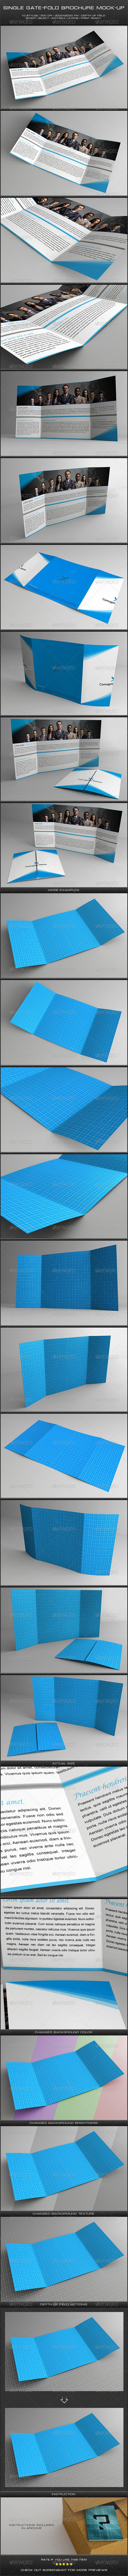 GraphicRiver Single Gate-Fold Brochure Mock-Up 5442623